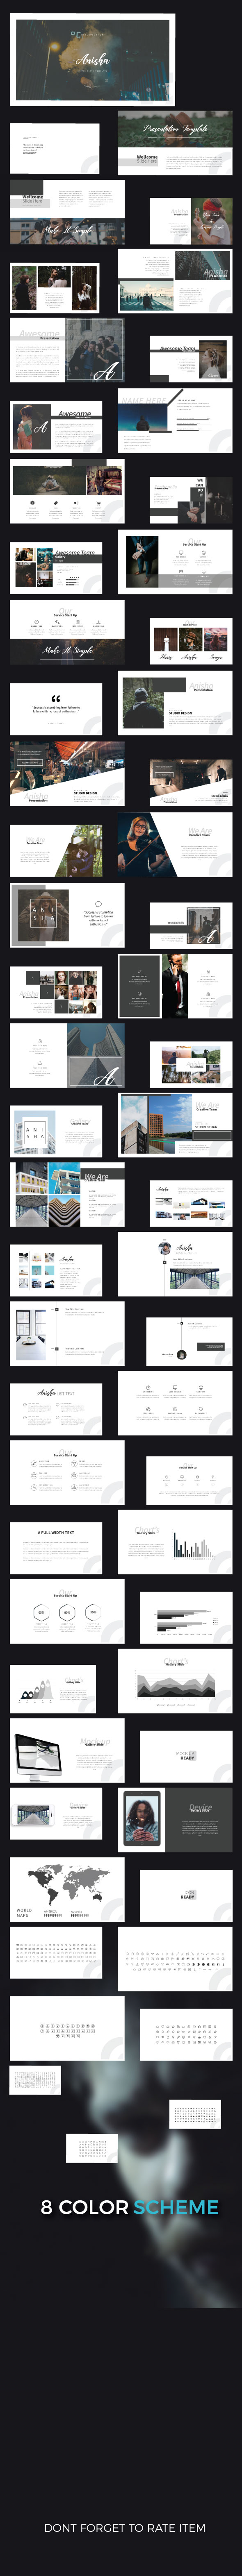 Anisha Powerpoint - Business PowerPoint Templates